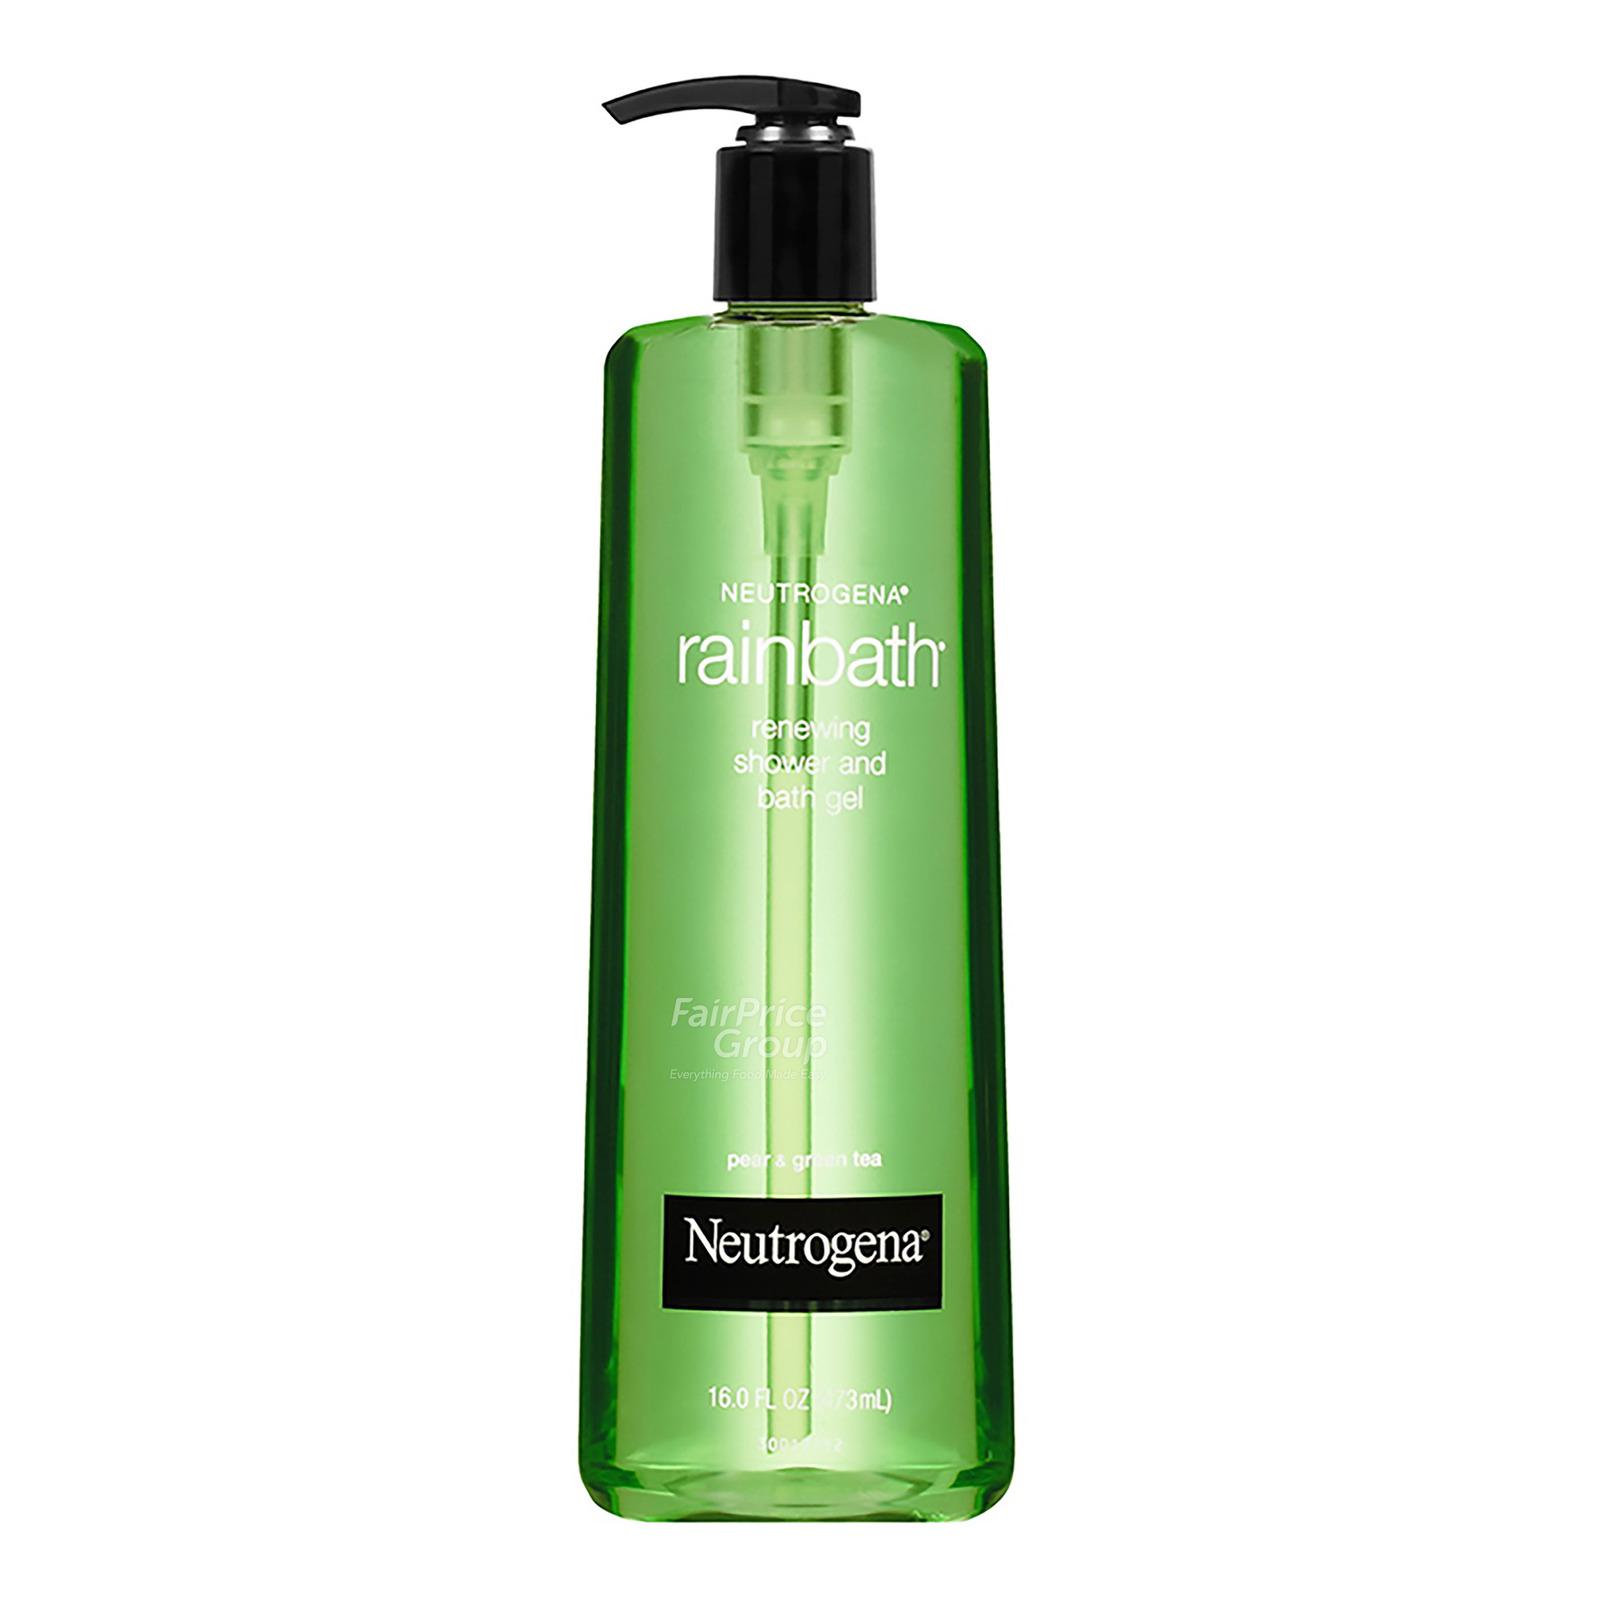 Neutrogena Rainbath Shower & Bath Gel - Pear Green Tea